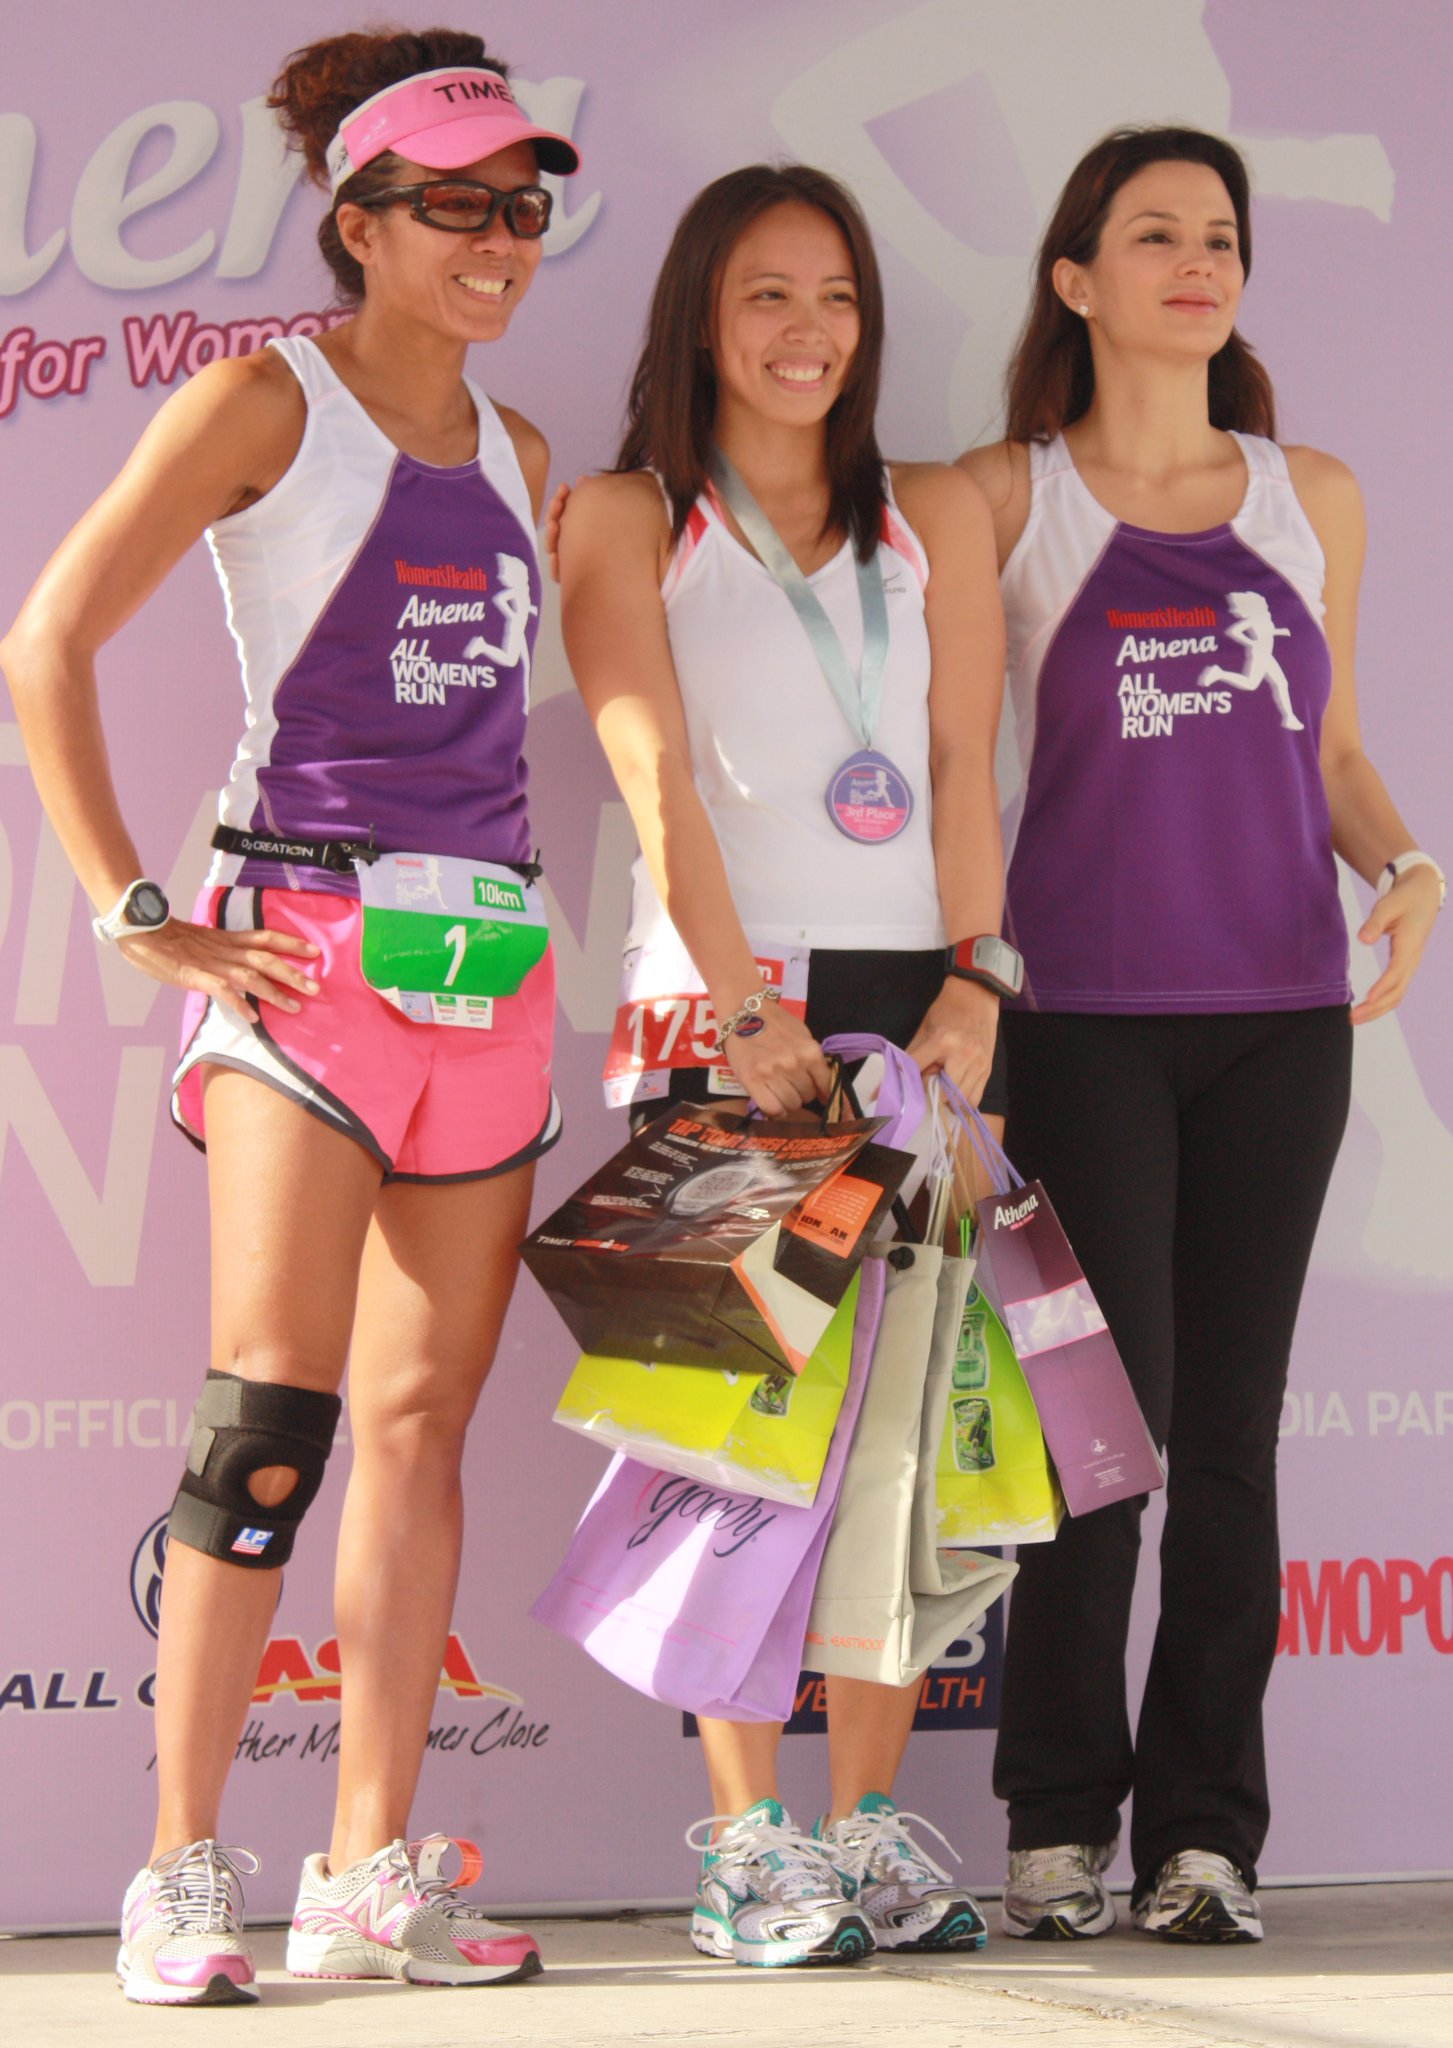 Athena All-Women's Run: With Lara and Bianca